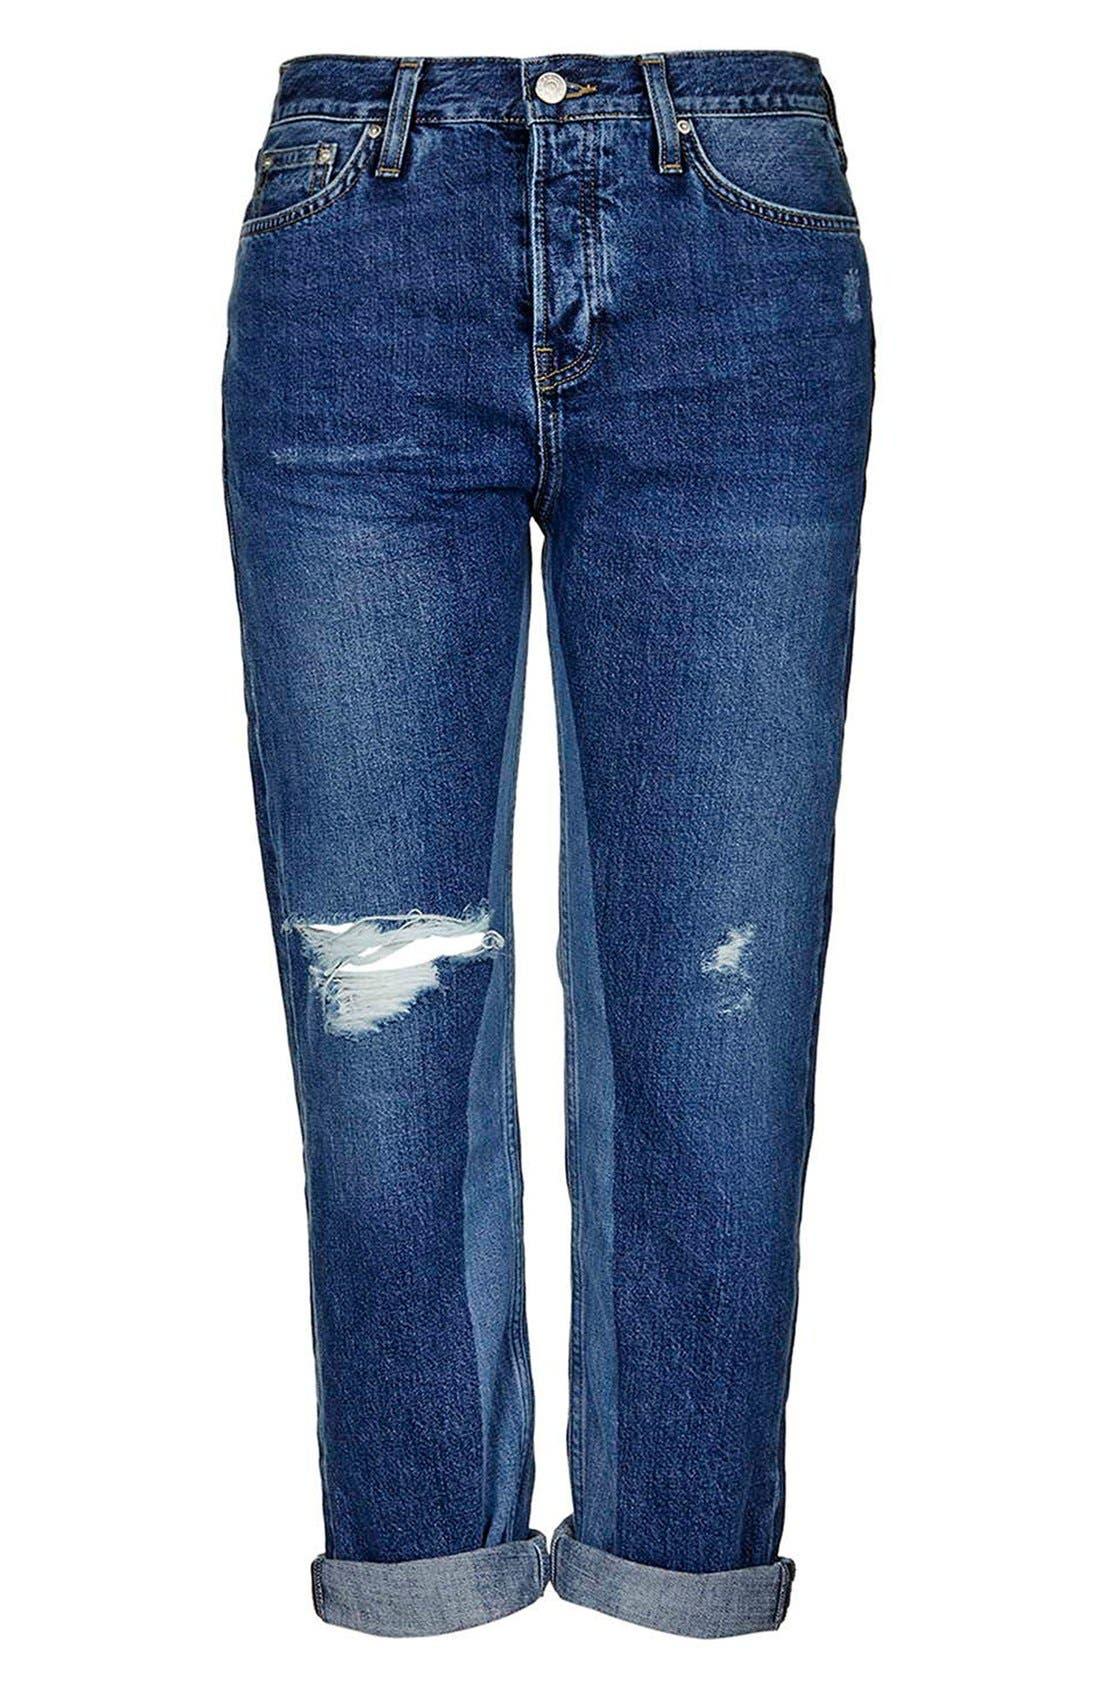 Alternate Image 5  - Topshop 'Patch' Two Tone High Rise Boyfriend Jeans